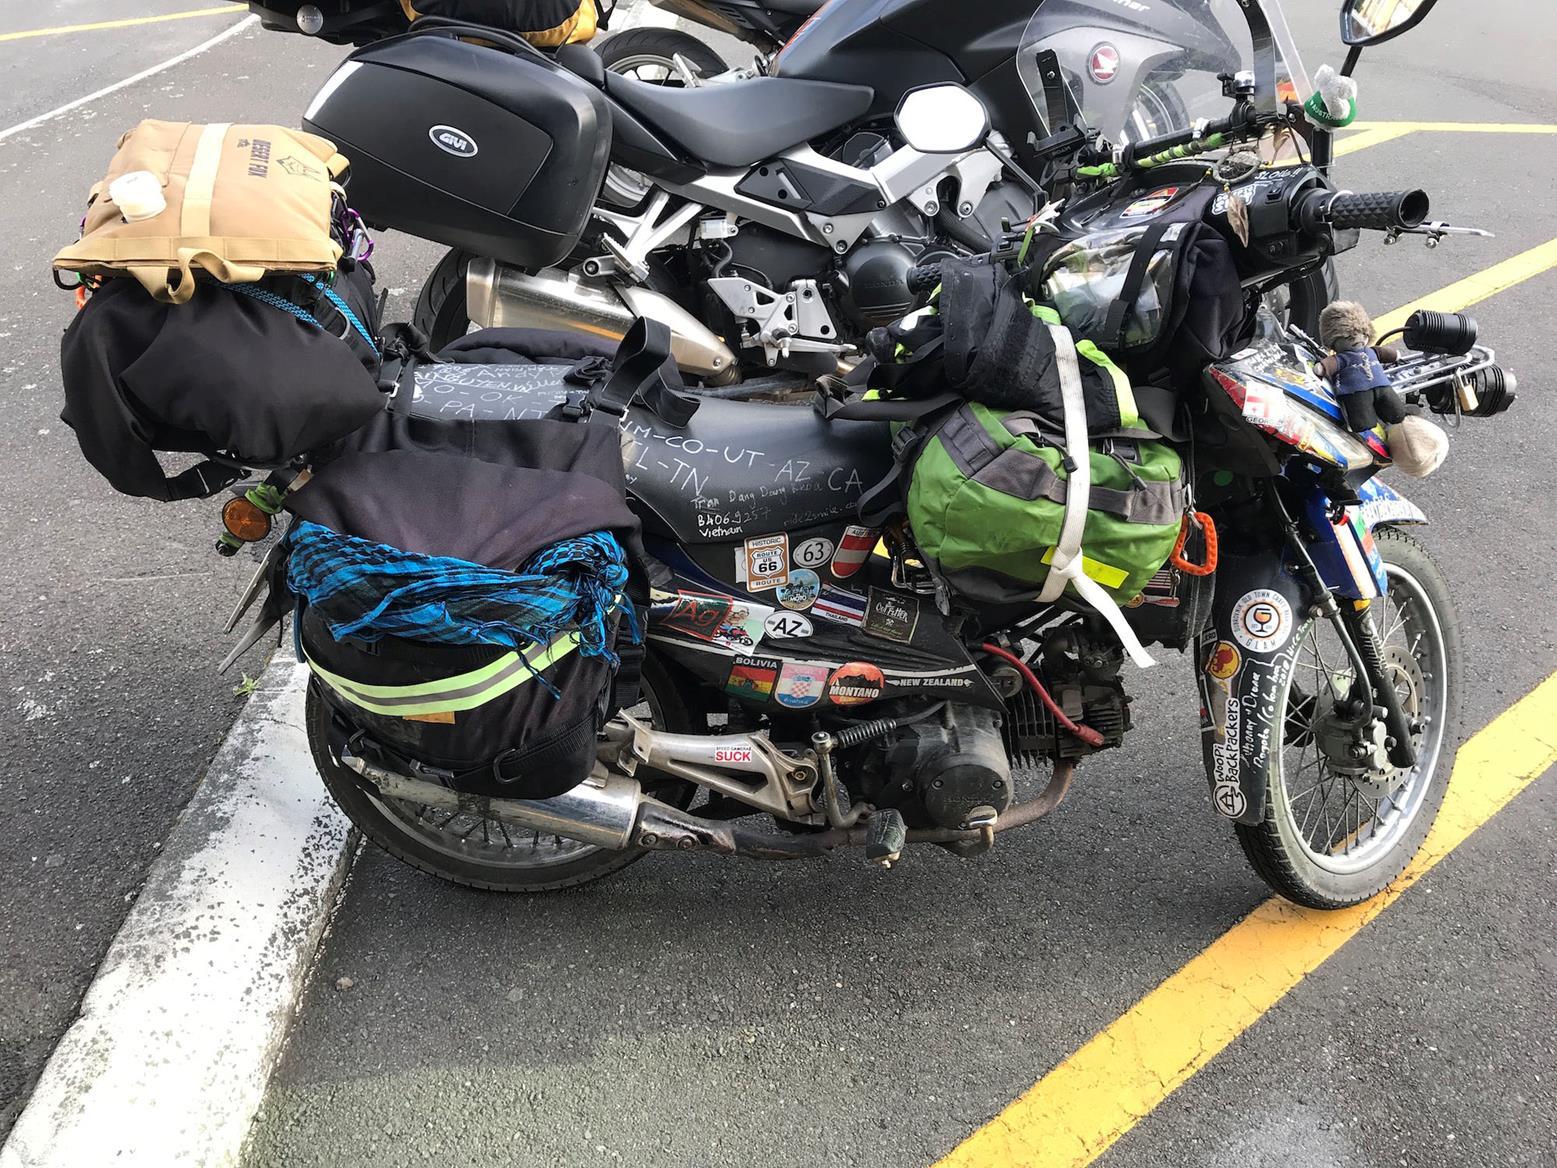 Khao's bike